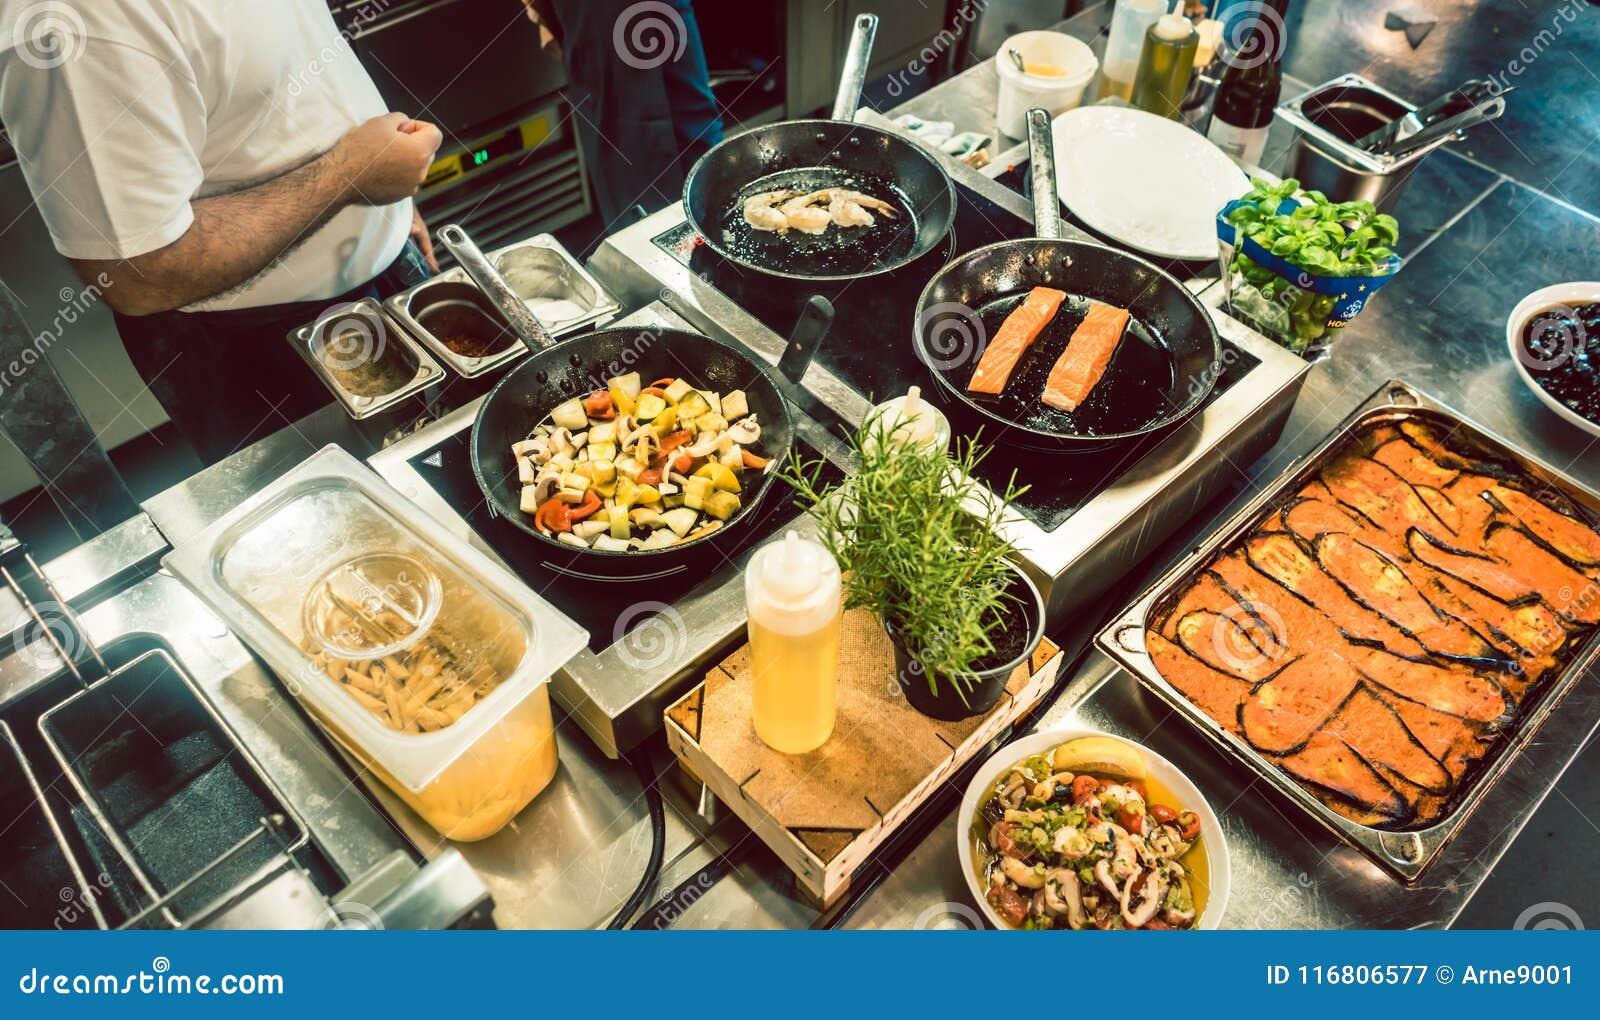 Vari ingredienti freschi sulla stufa di una cucina commerciale